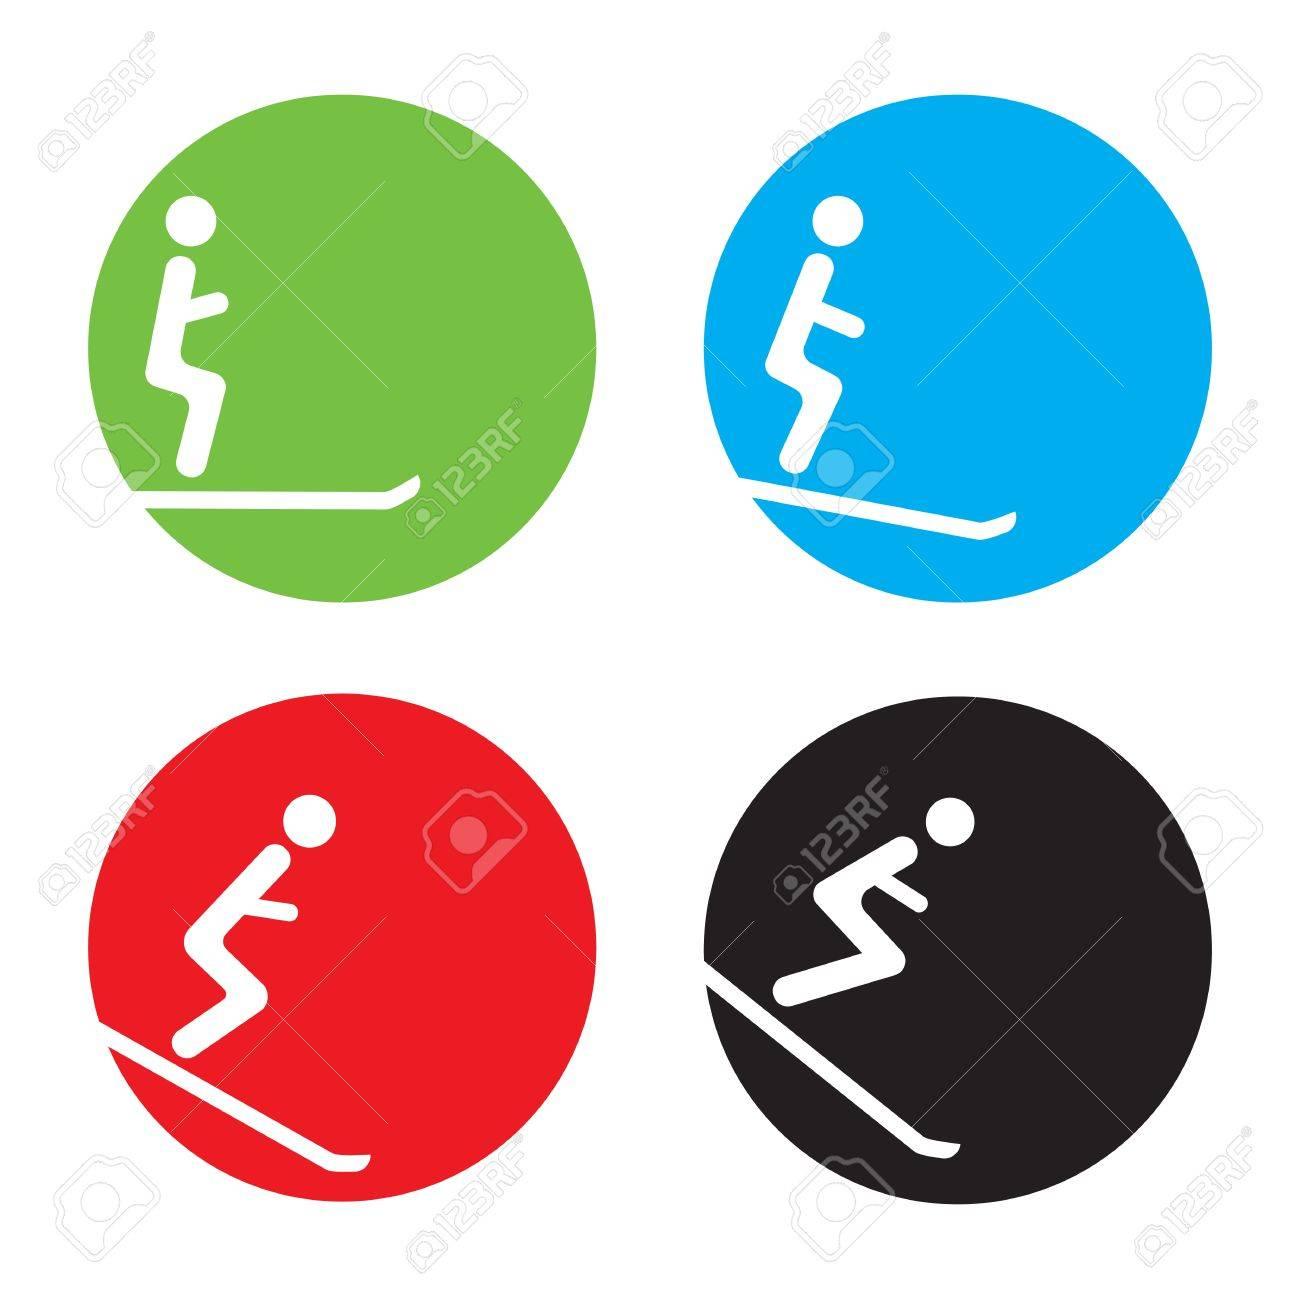 Ski icons Stock Vector - 18579639